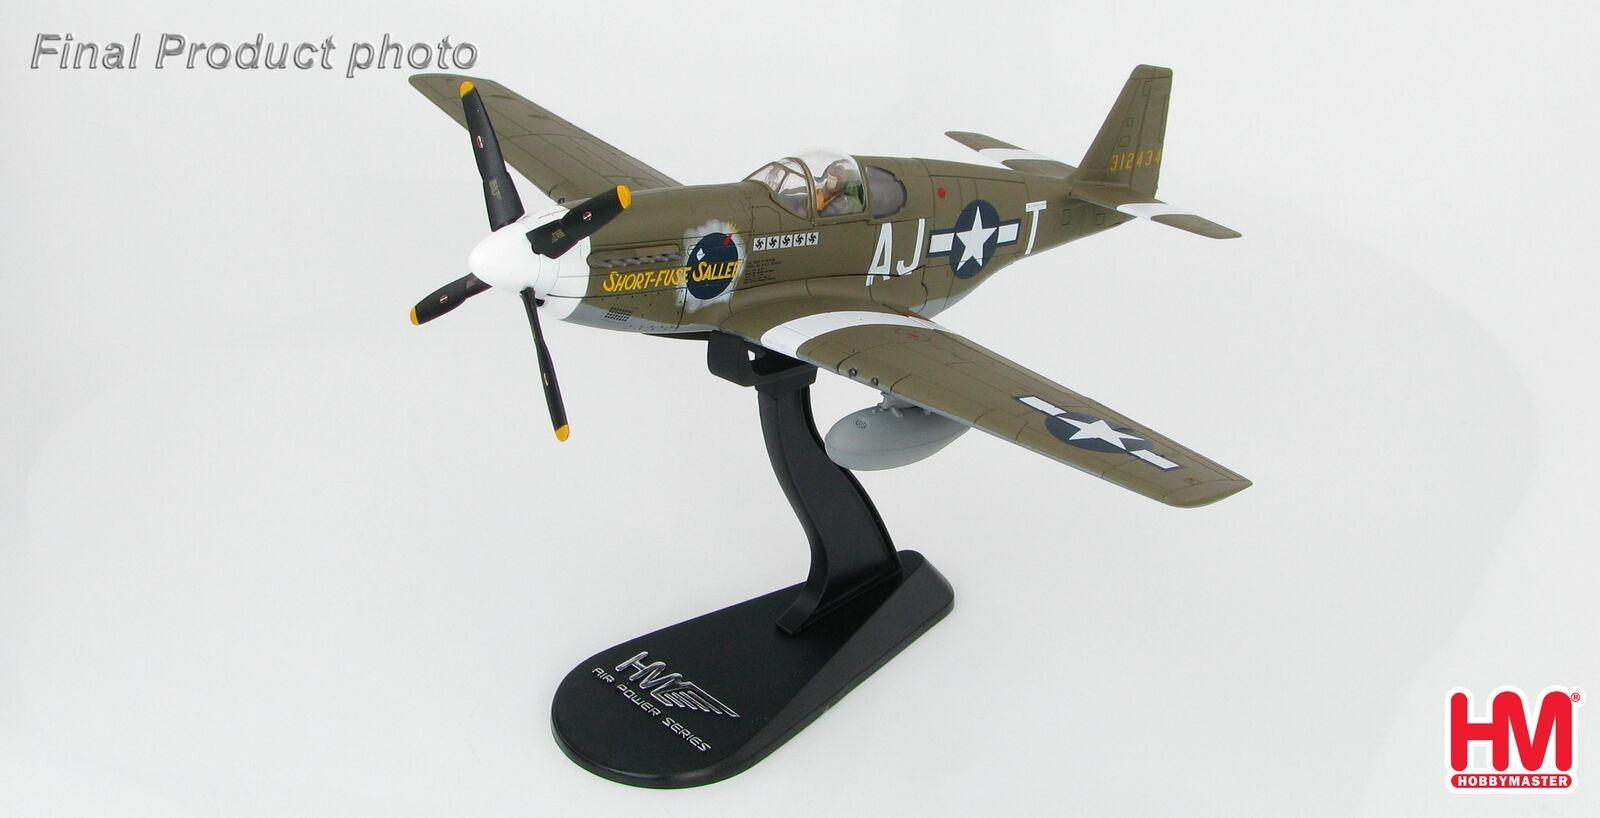 Hobby Master 1:48 HA8509 P-51B Mustang Short-Fusible de Salé 356th FS 354th